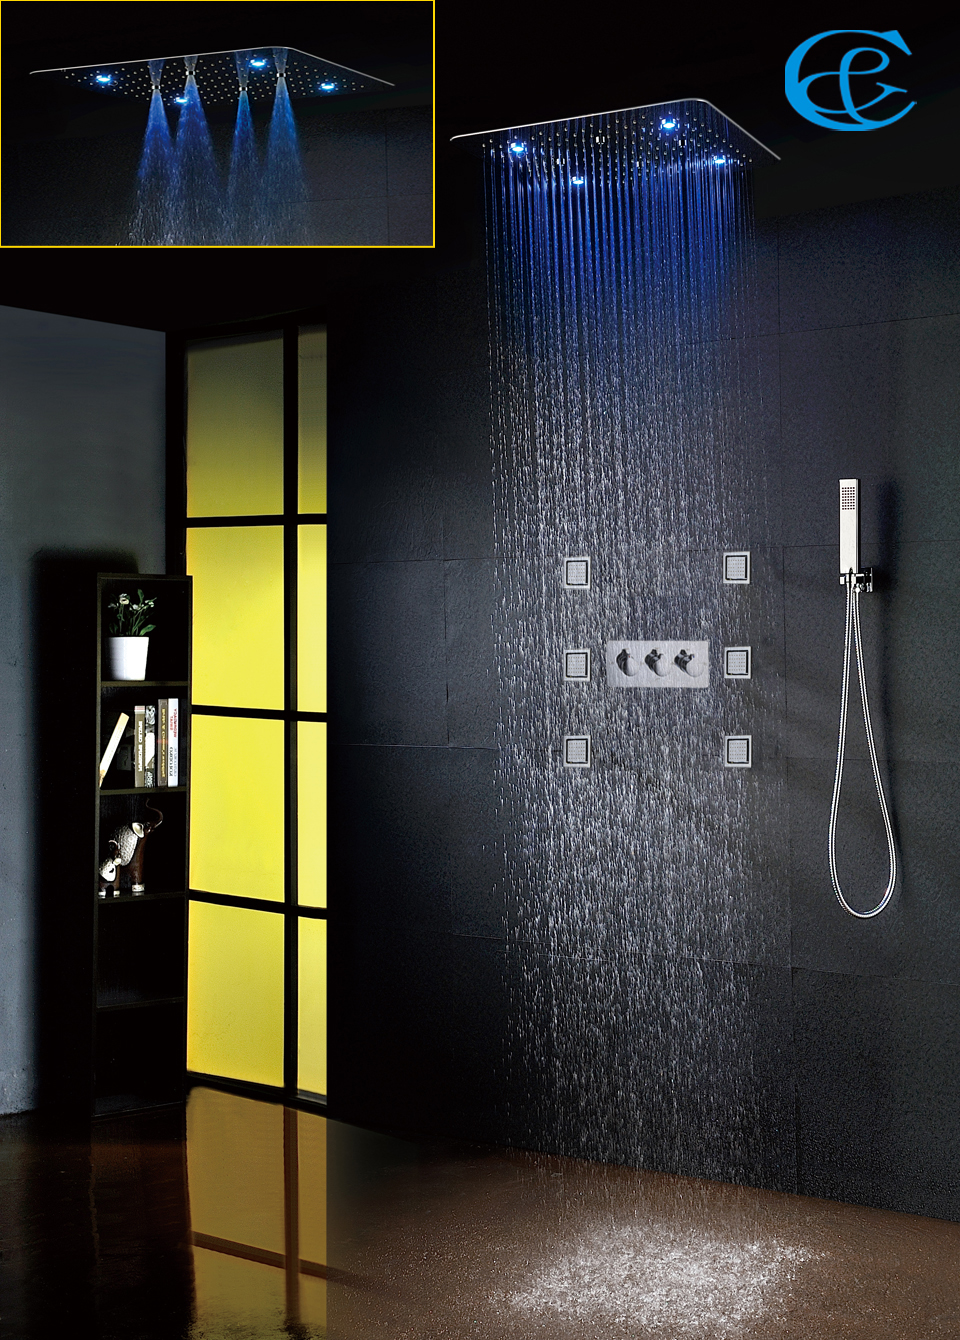 Bathroom Shower Faucet Set Accessories Faucet Panel Tap Hot And Cold Water Mixer LED Ceiling Shower Head Rain Bath & Shower